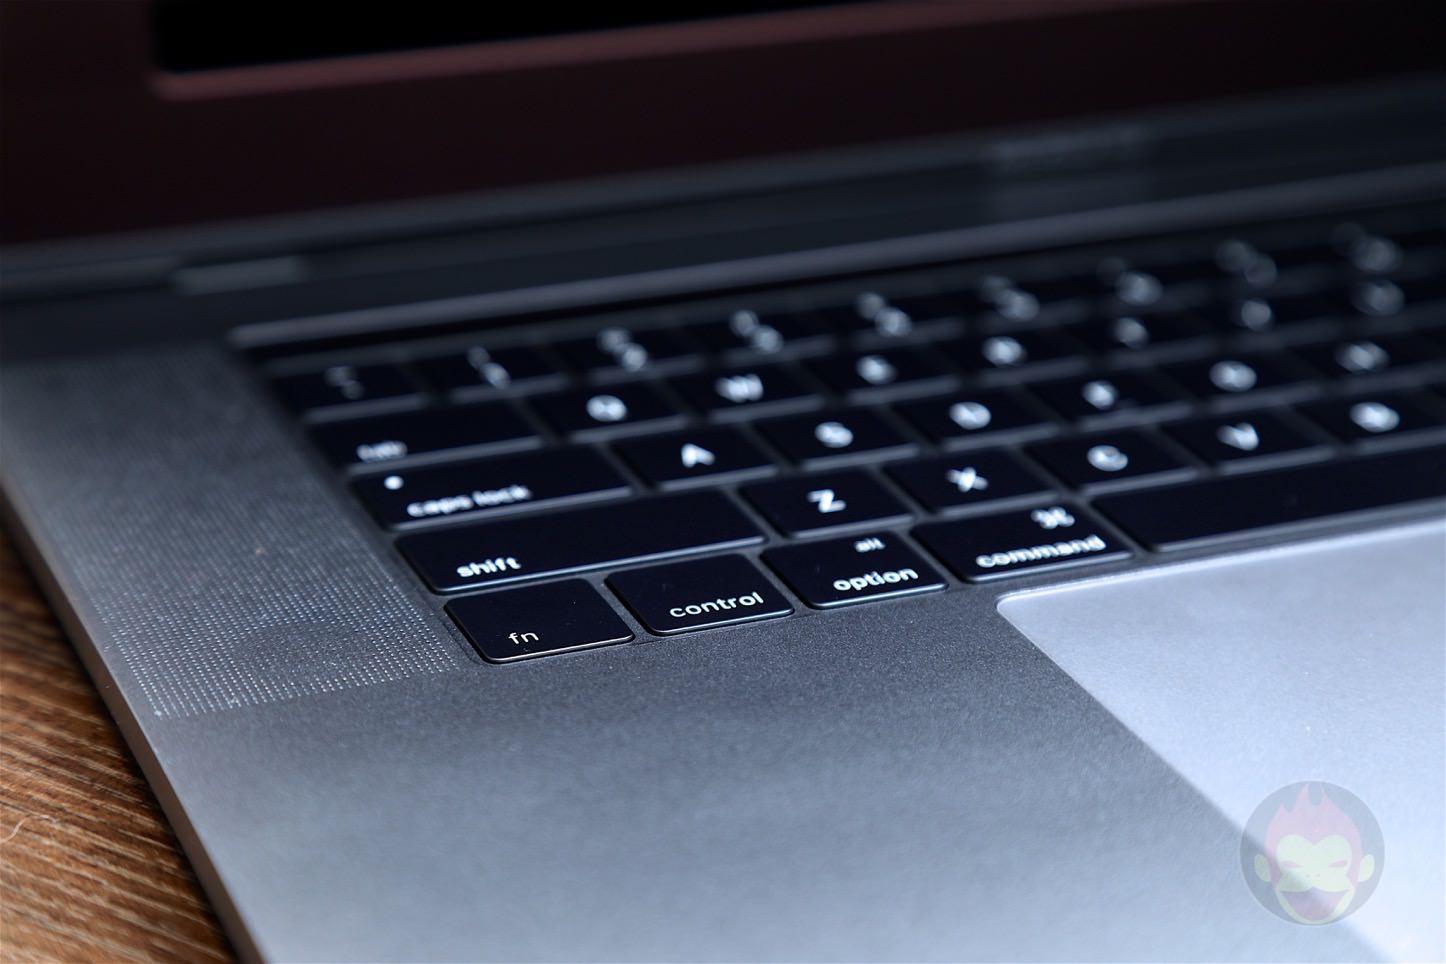 MacBook-Pro-Late-2016-15inch-model-06.jpg